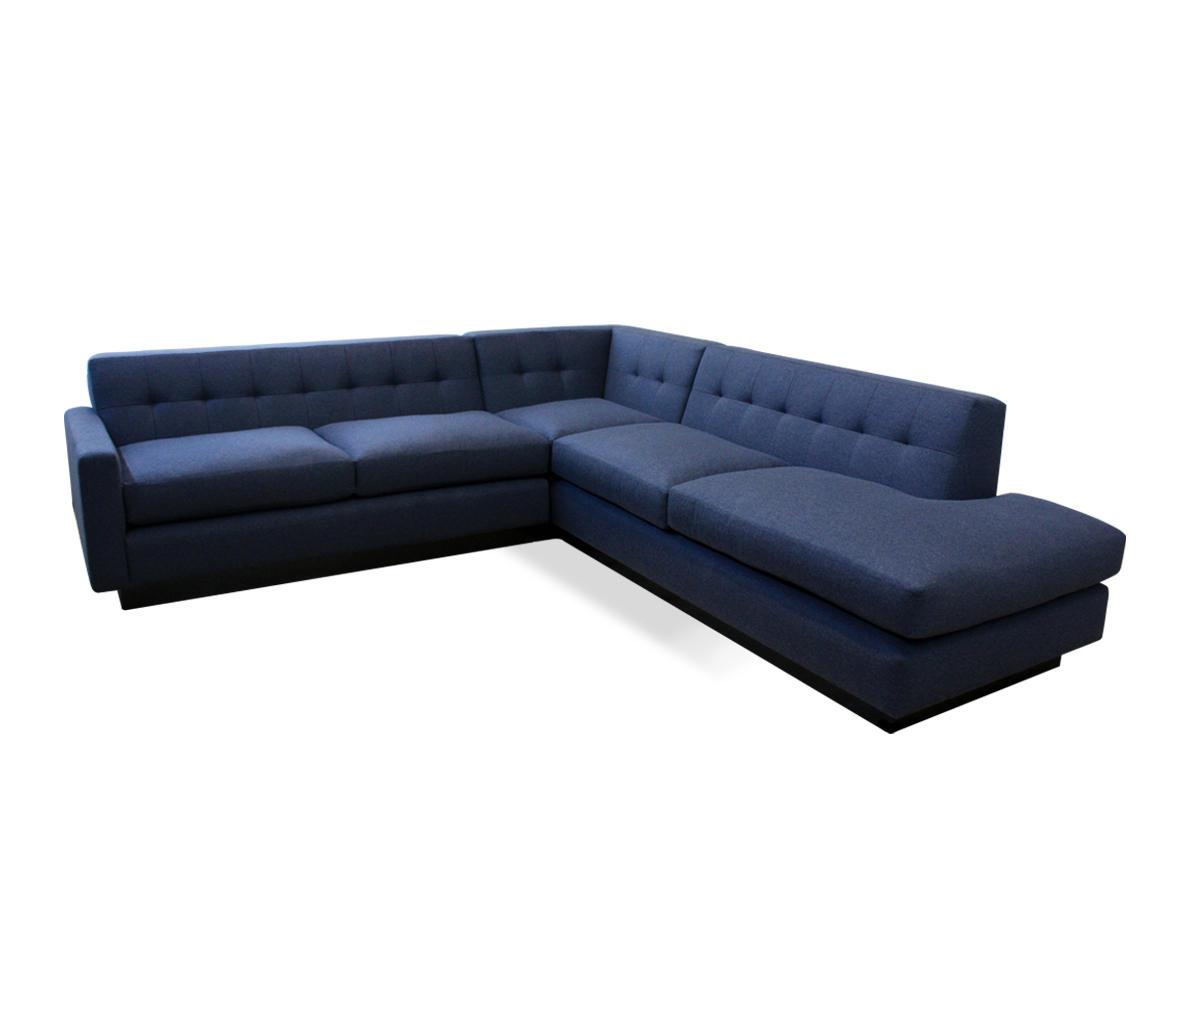 Cool Alderton Sectional Sofas Von Bespoke By Luigi Gentile Pdpeps Interior Chair Design Pdpepsorg